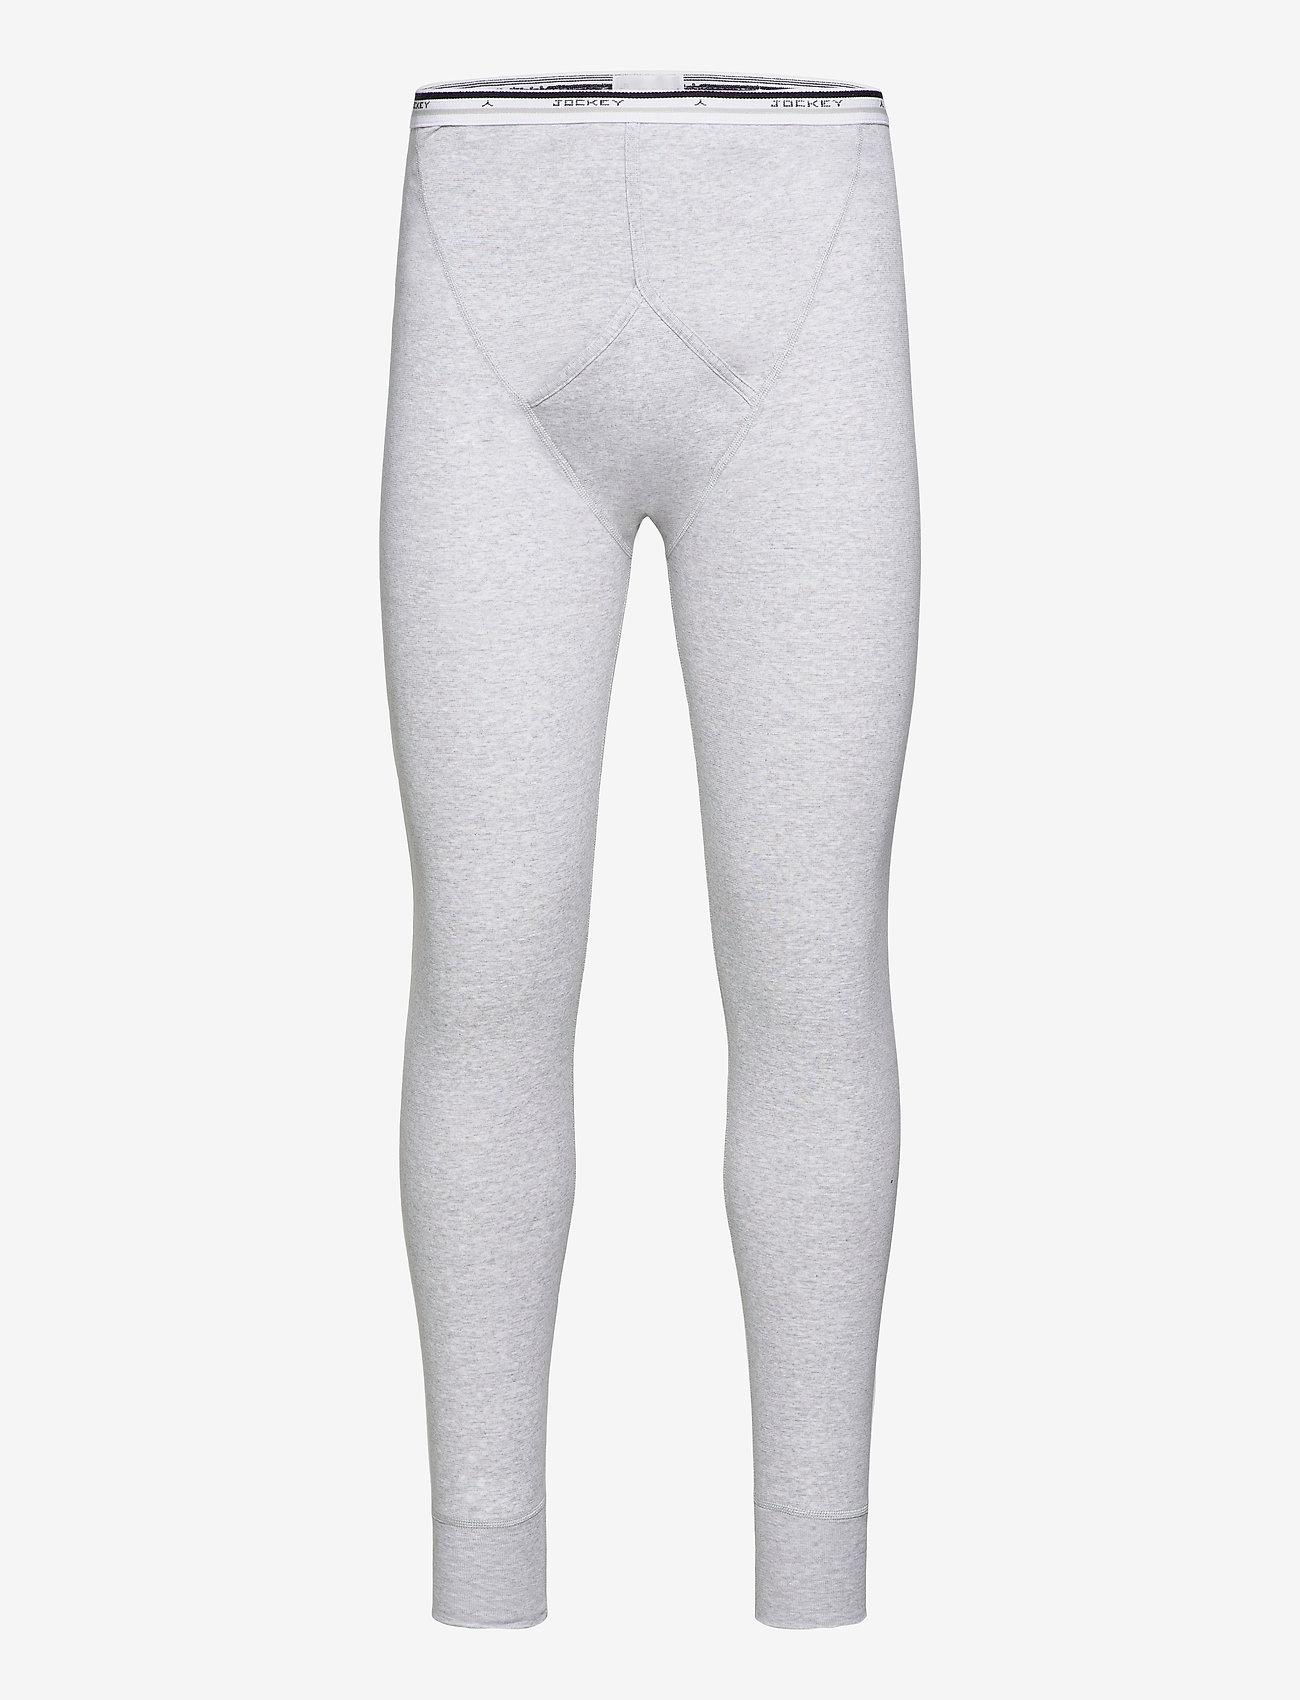 Jockey - Long spurt - base layer bottoms - grey - 0